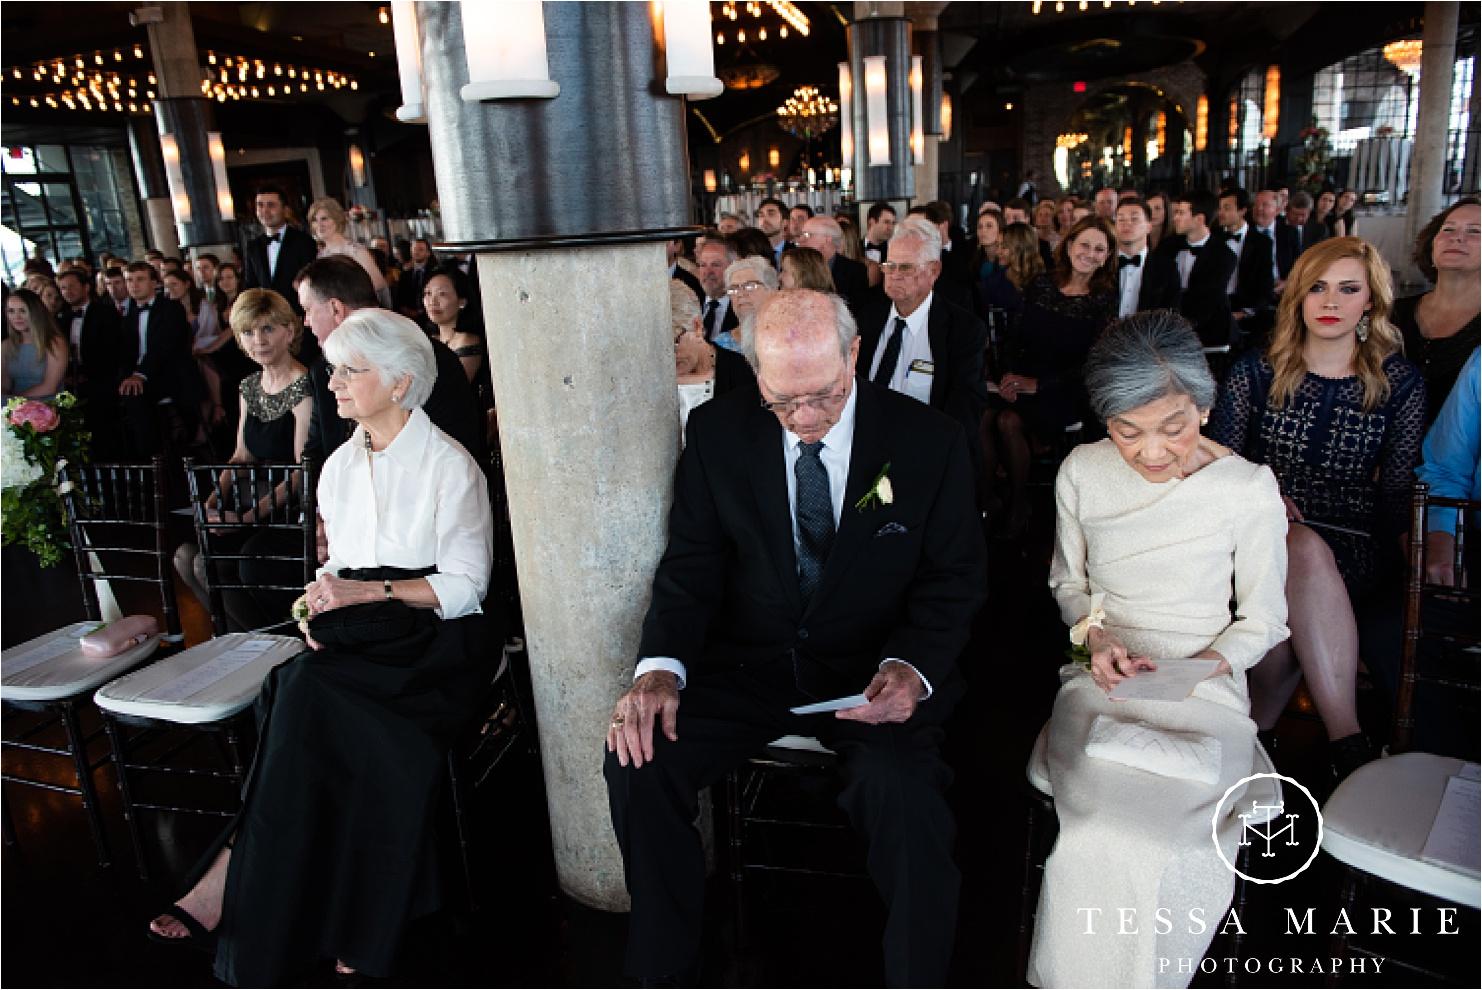 Tessa_marie_weddings_houston_wedding_photographer_The_astorian_0109.jpg